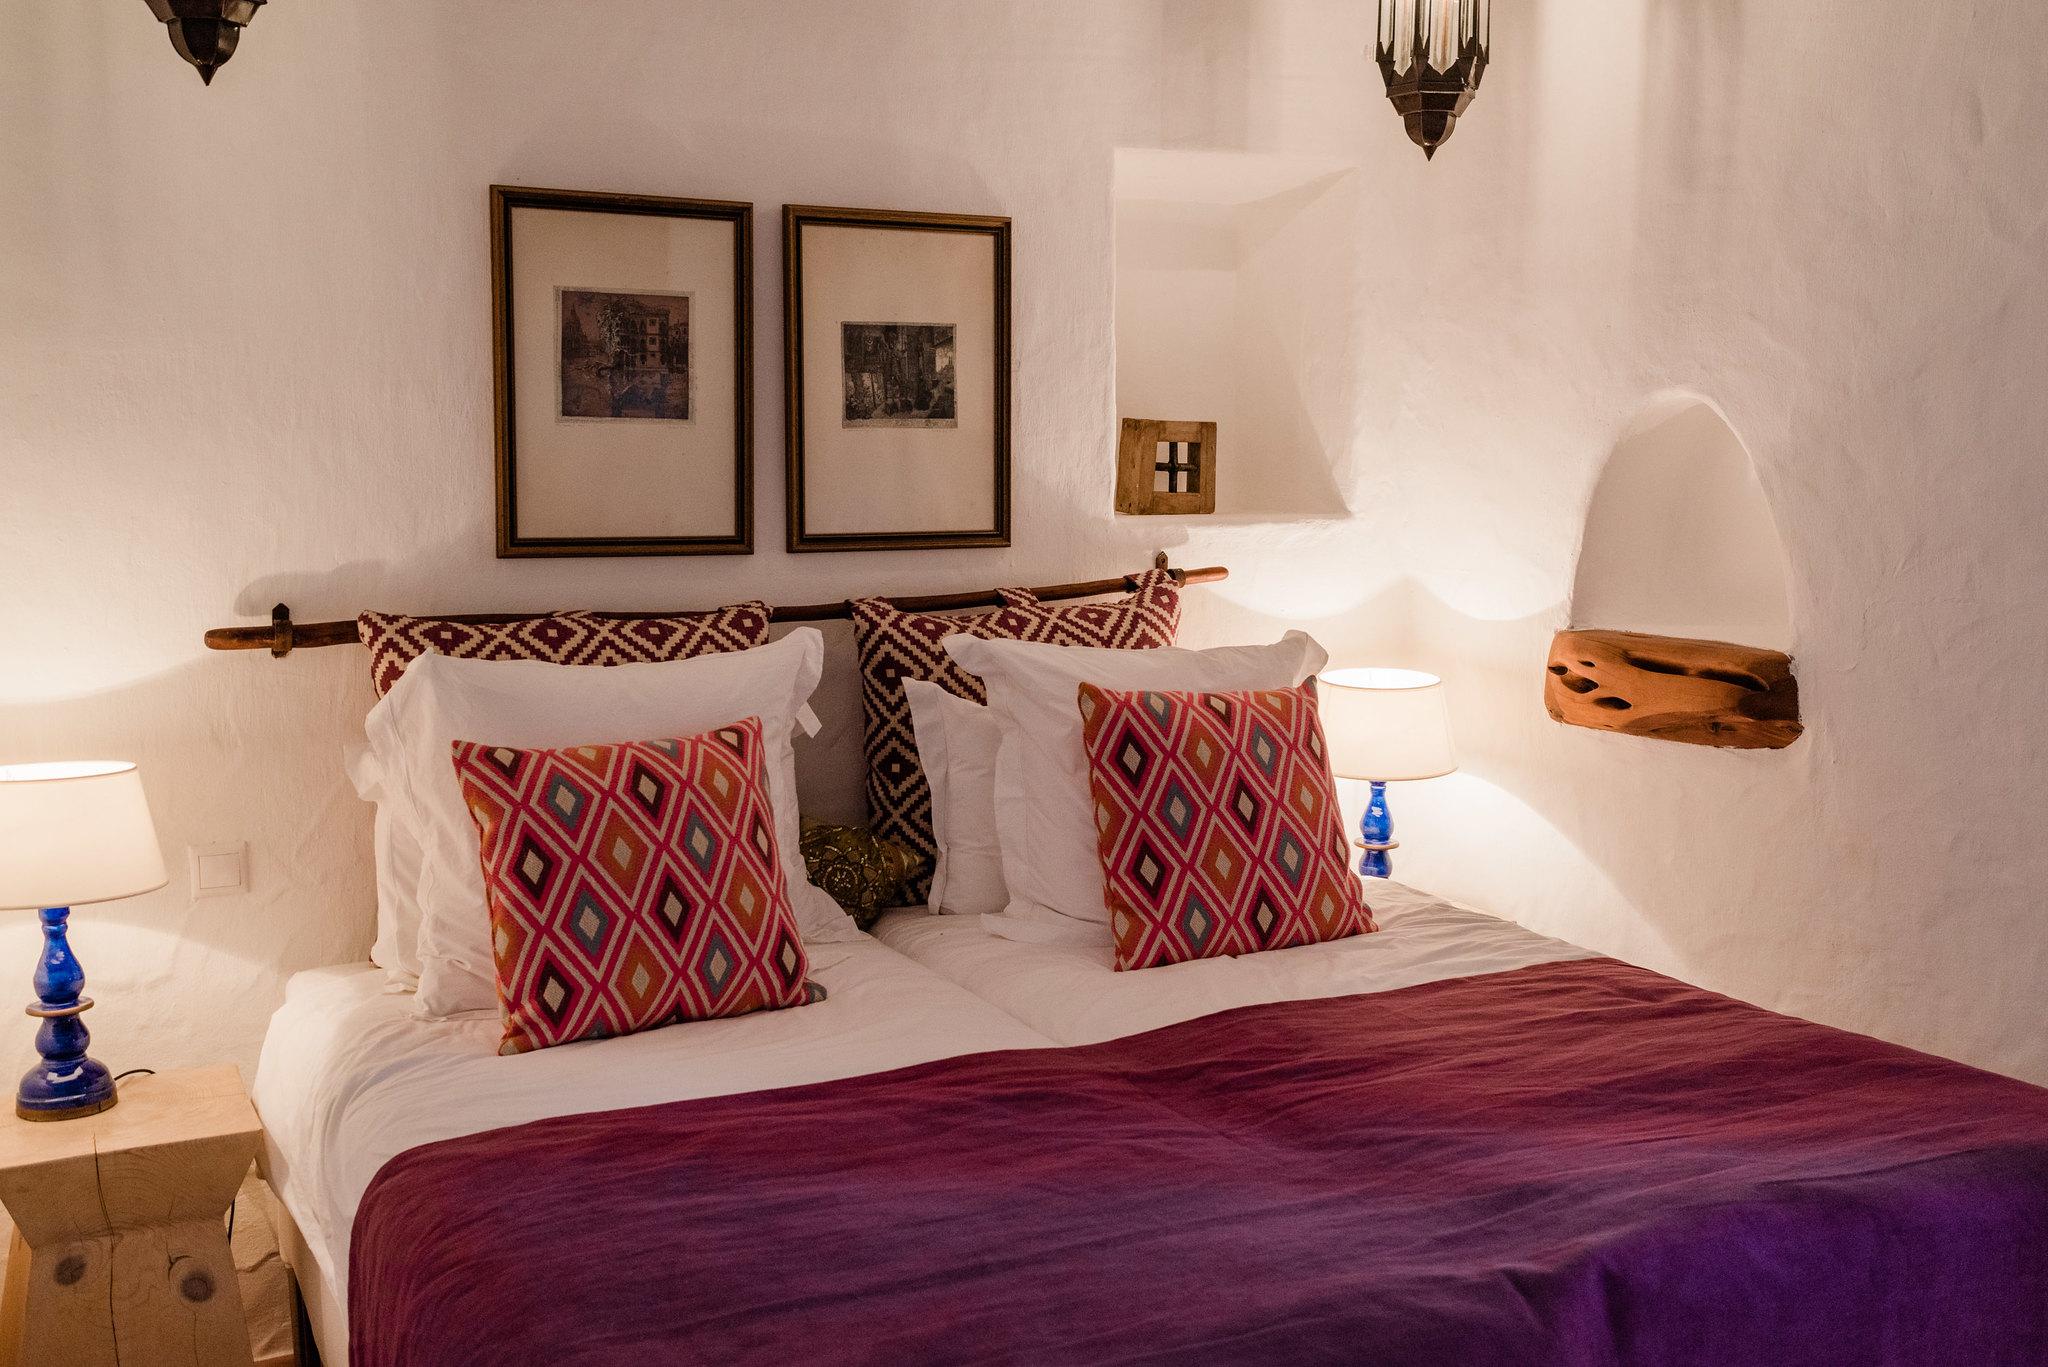 https://www.white-ibiza.com/wp-content/uploads/2020/05/white-ibiza-villas-can-sabina-interior-bedroom7.jpg